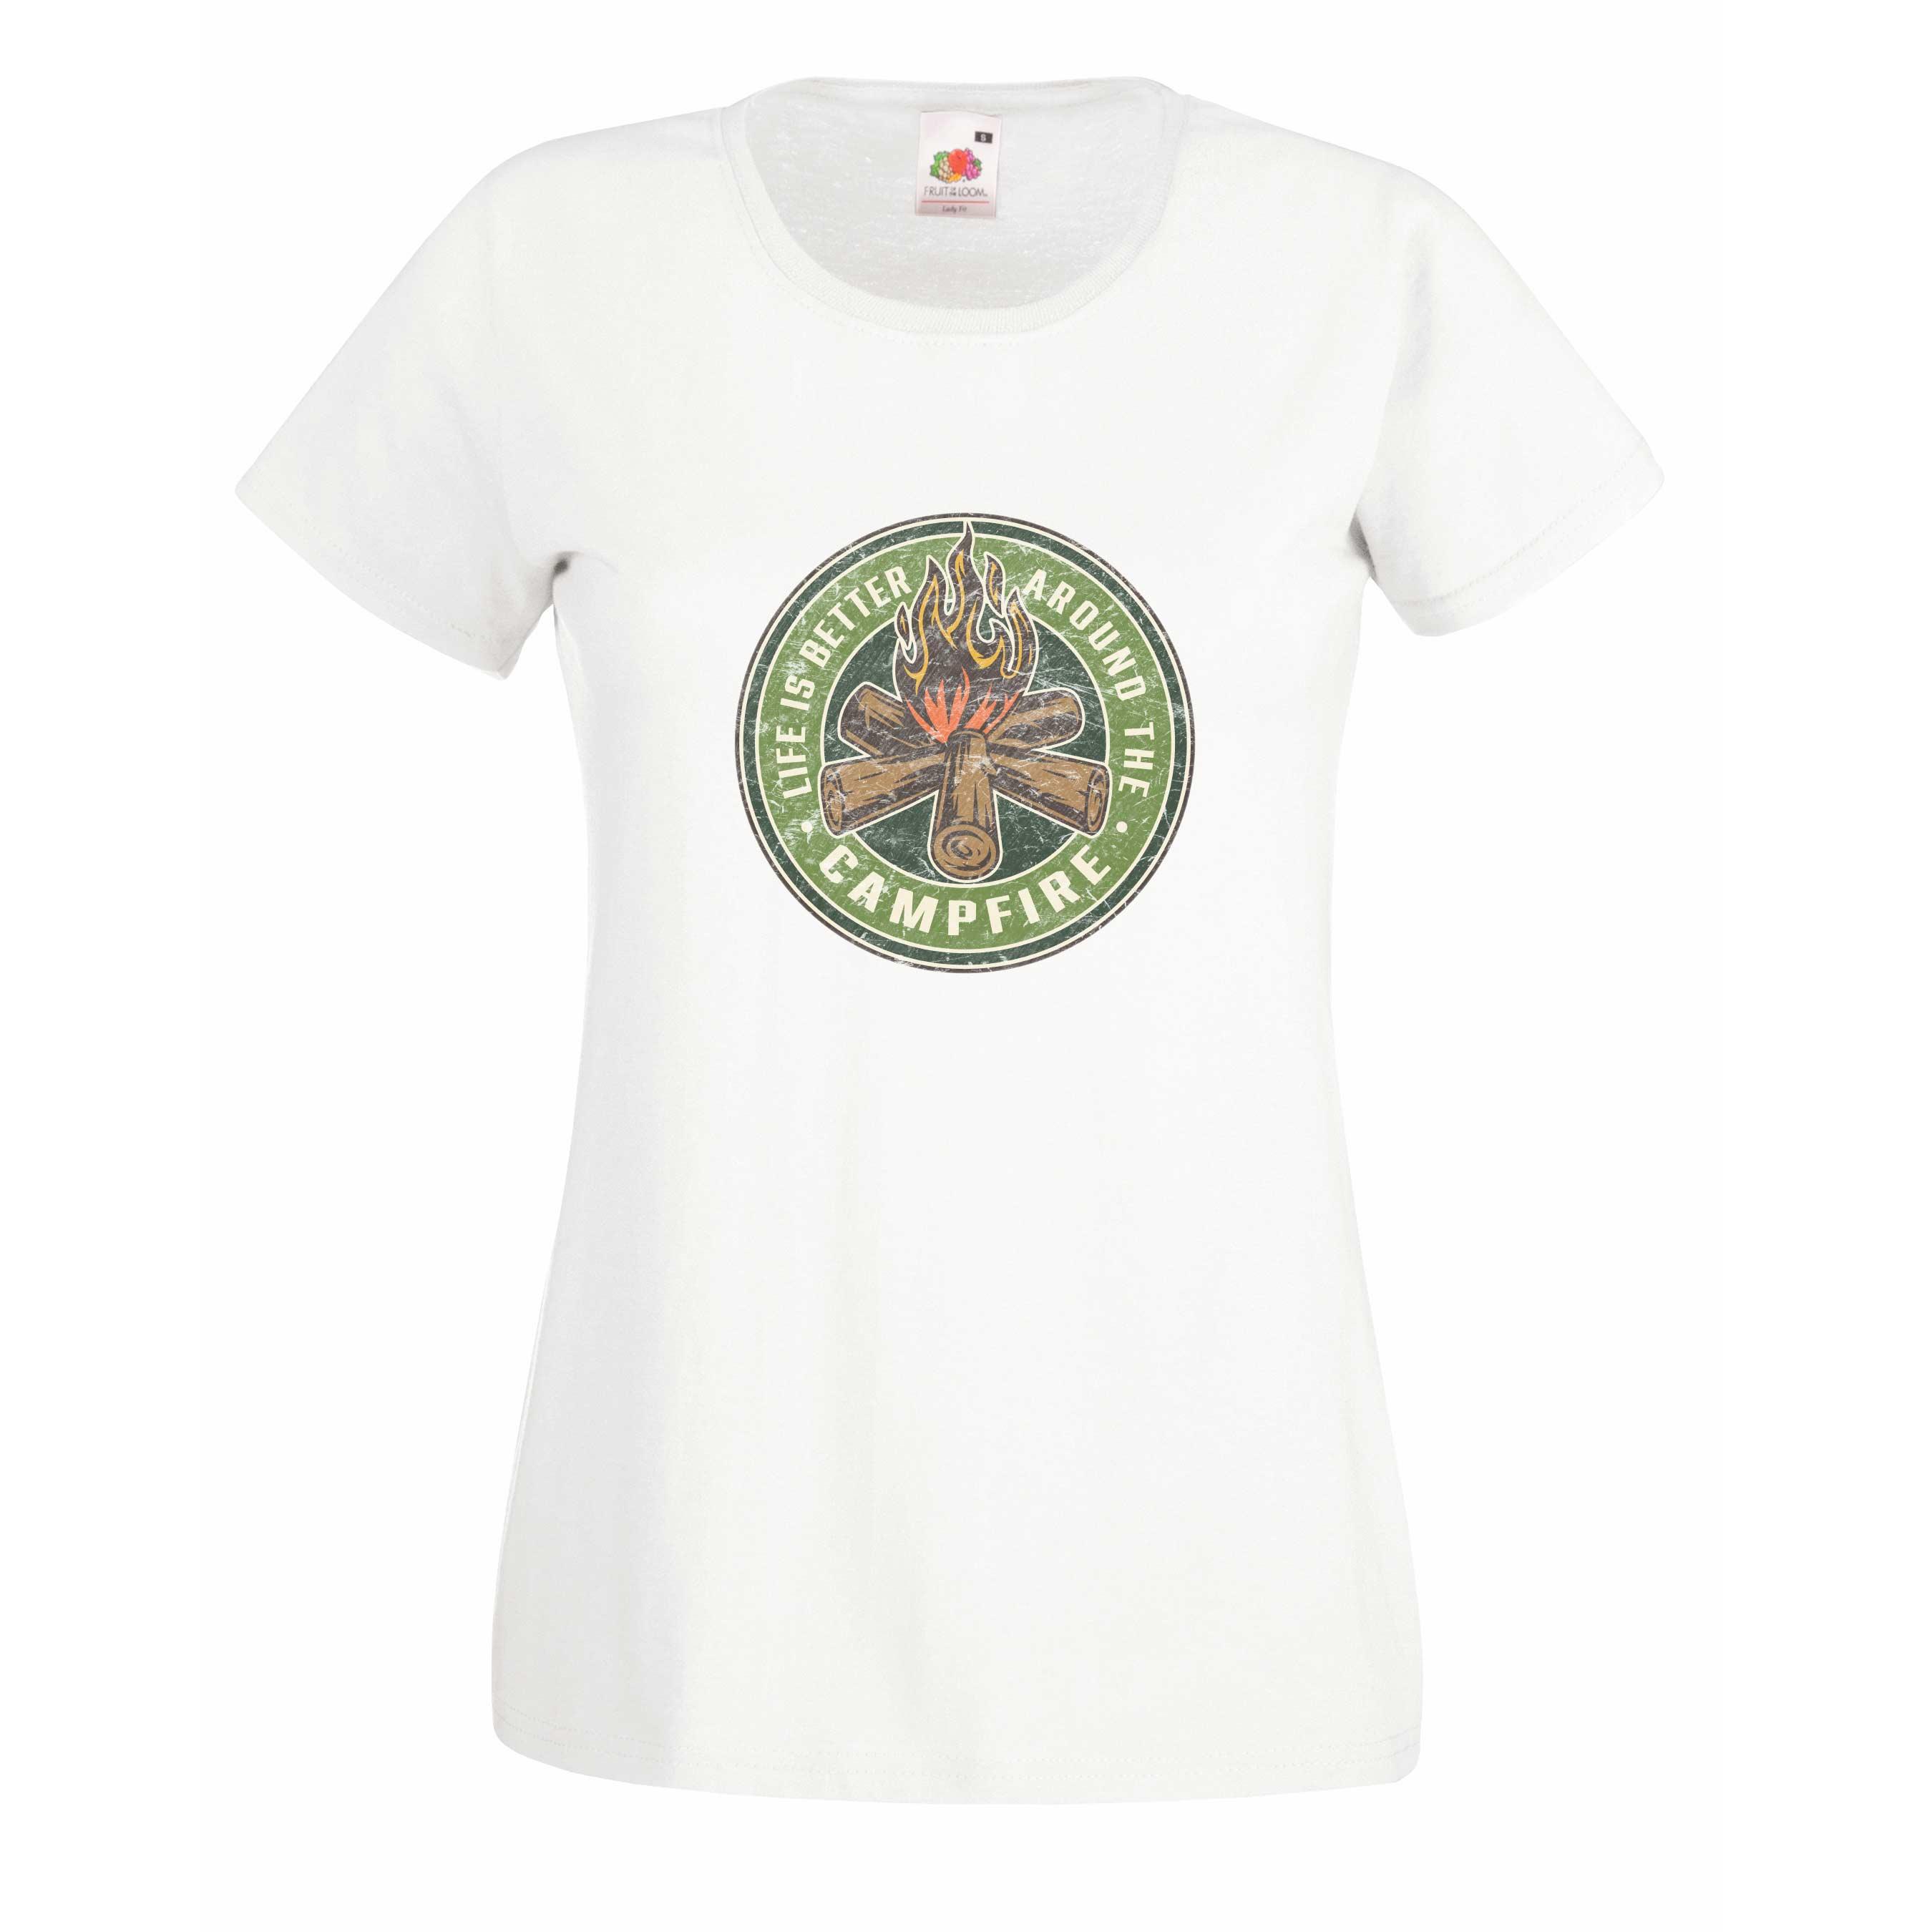 Campfire design for t-shirt, hoodie & sweatshirt